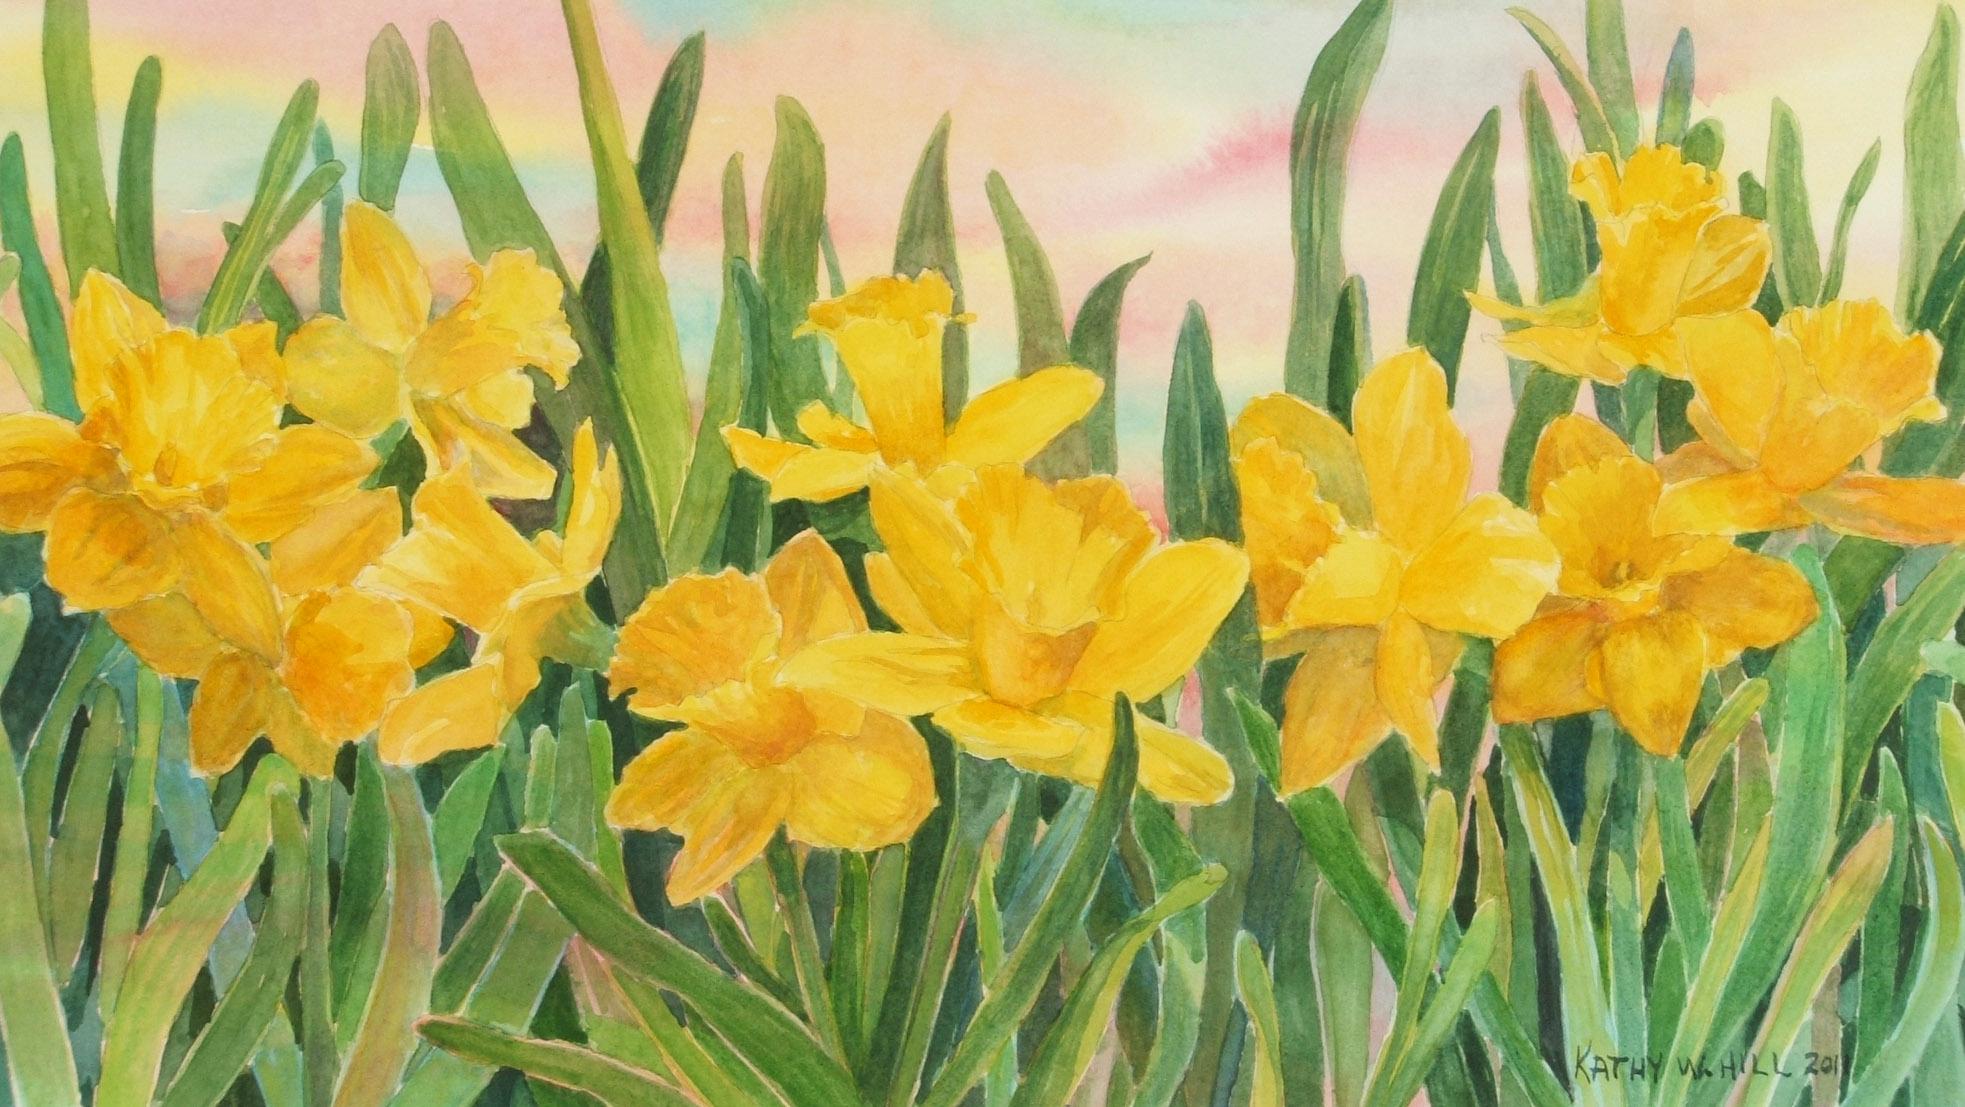 Hooray for Spring! - Print